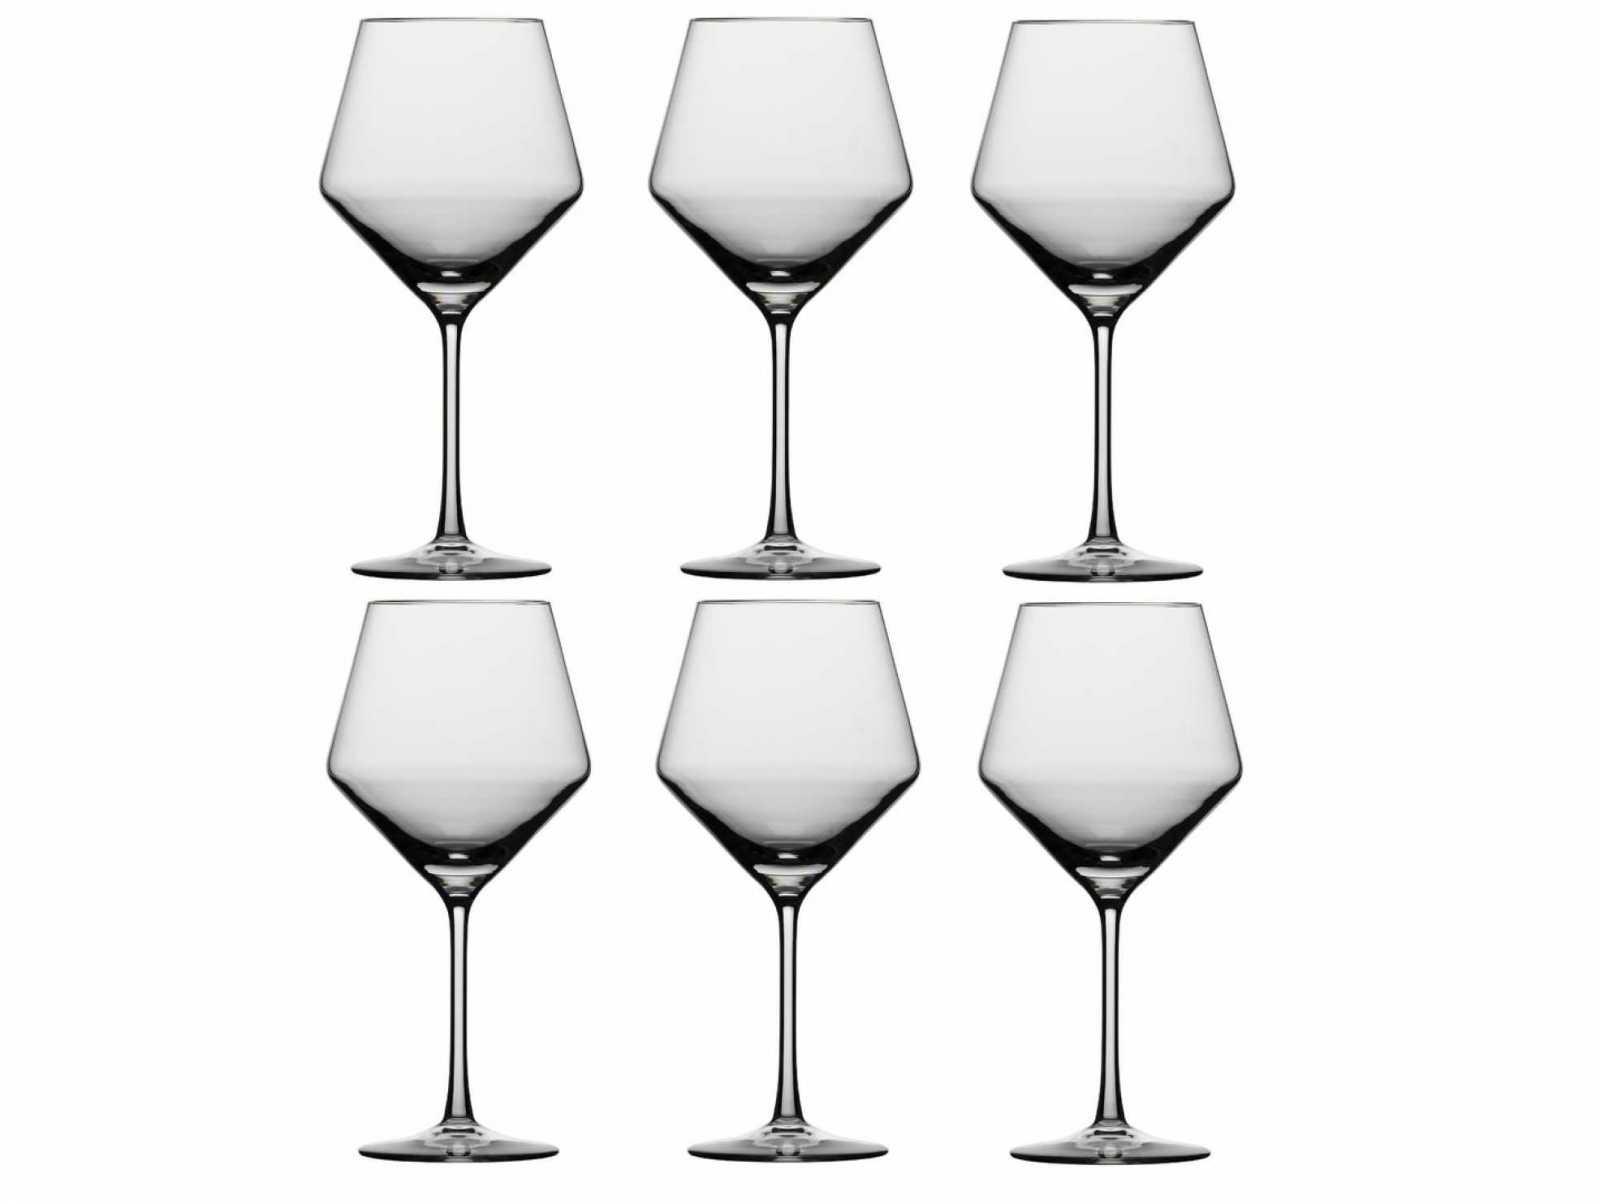 Онлайн каталог PROMENU: Набор бокал для красного вина Schott Zwiesel PURE, объем 0,692 л, прозрачный, 6 штук Schott Zwiesel 112421_6шт